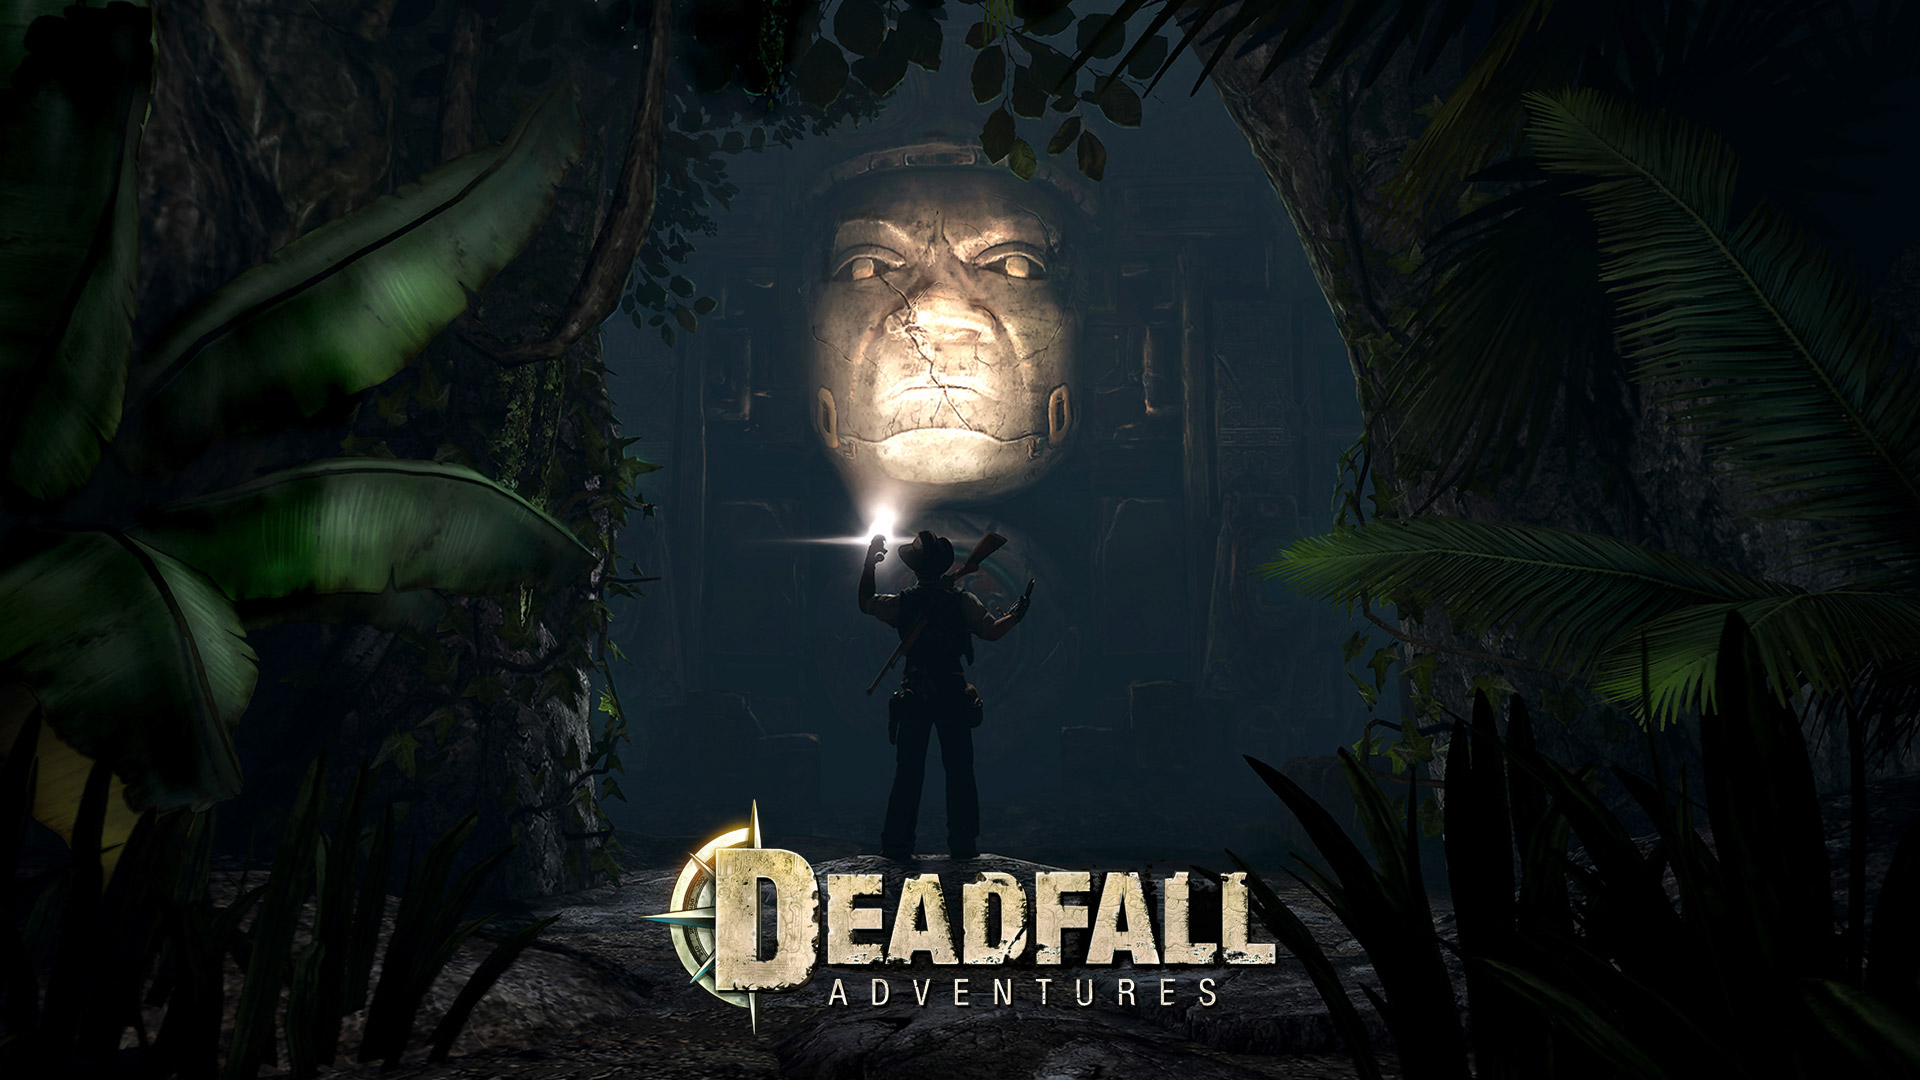 Deadfall Adventures Wallpaper in 1920x1080